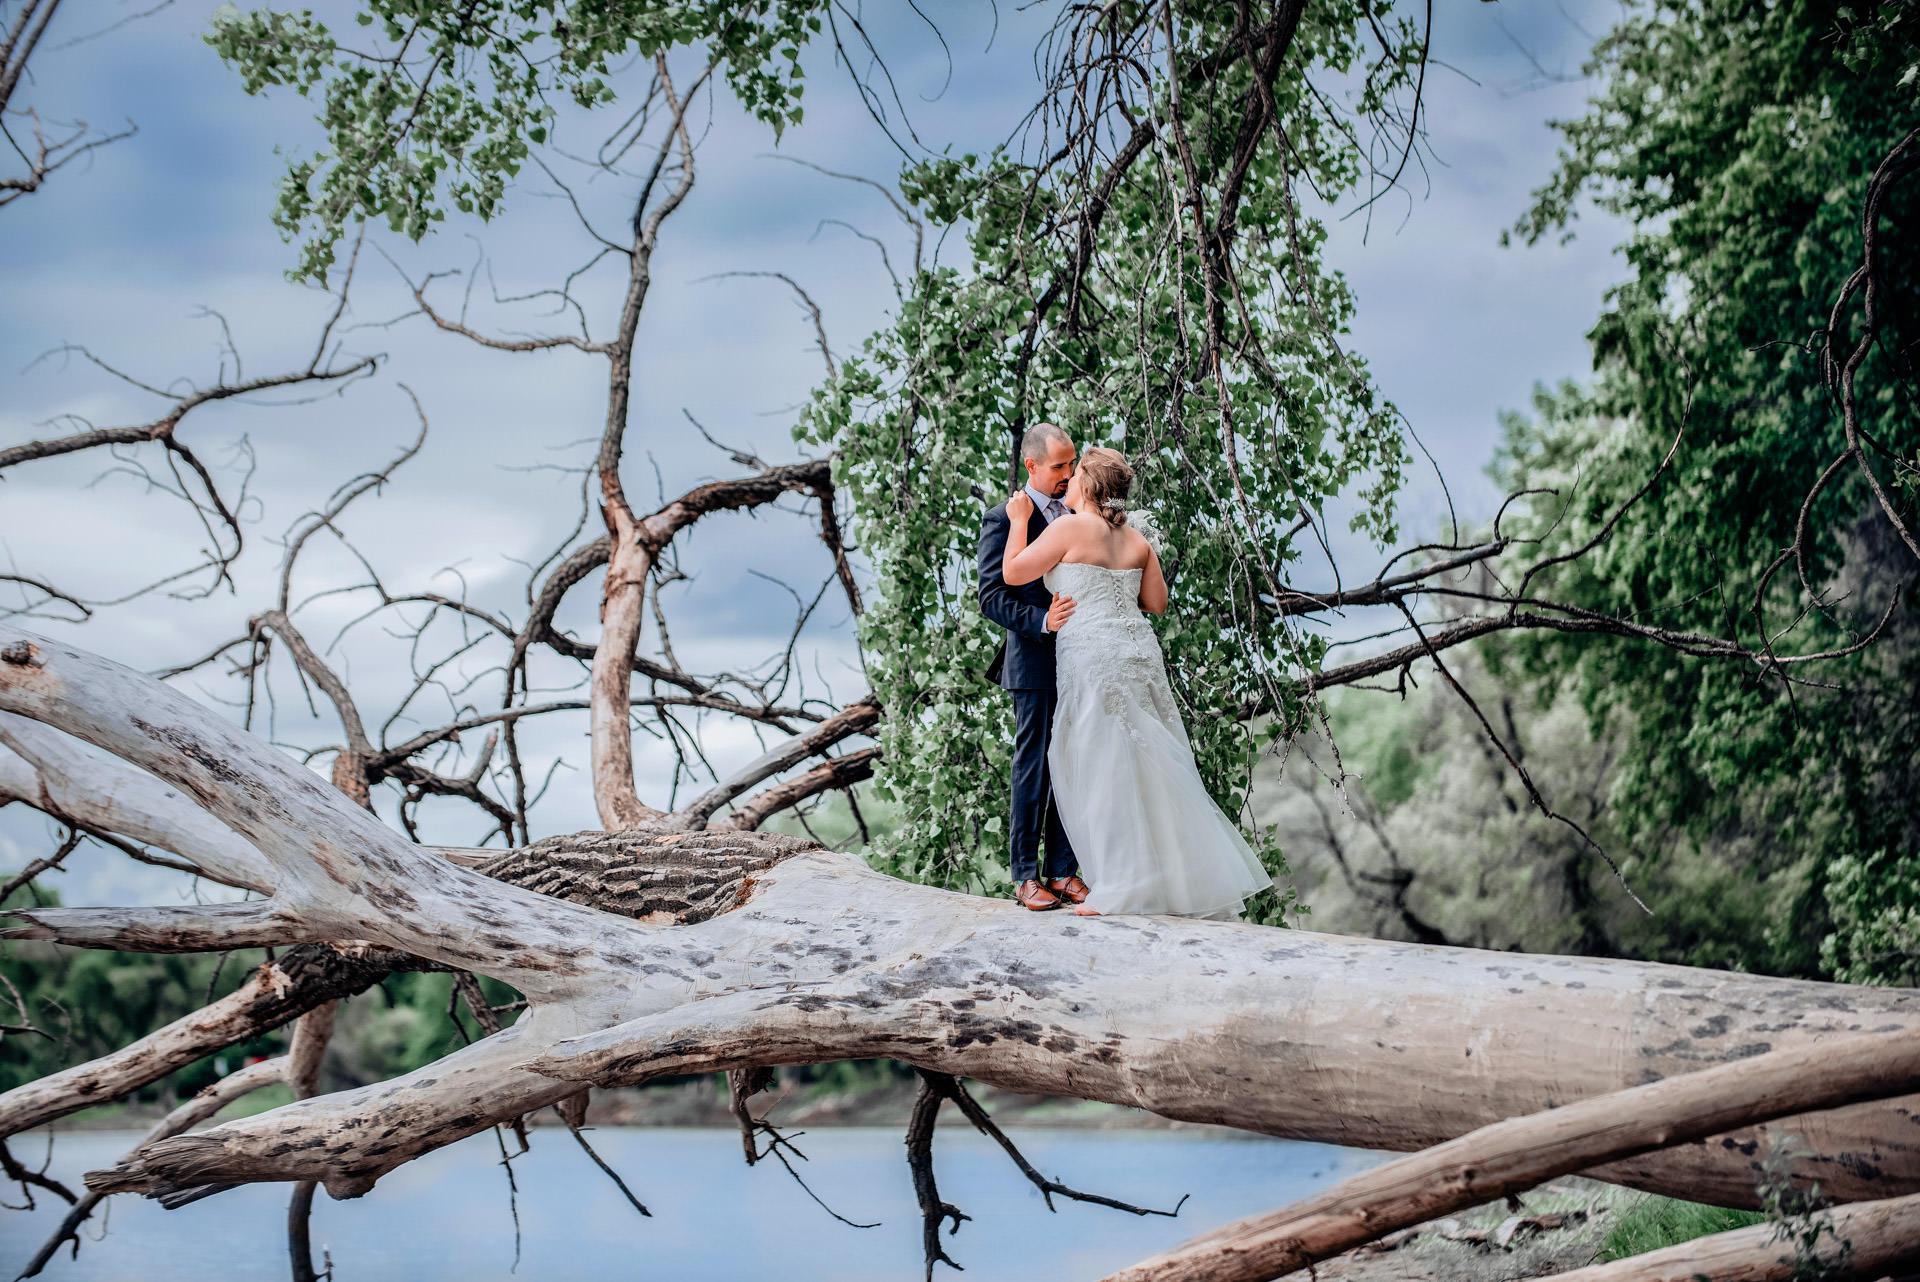 Stardust Photography - Winnipeg Wedding Photographer